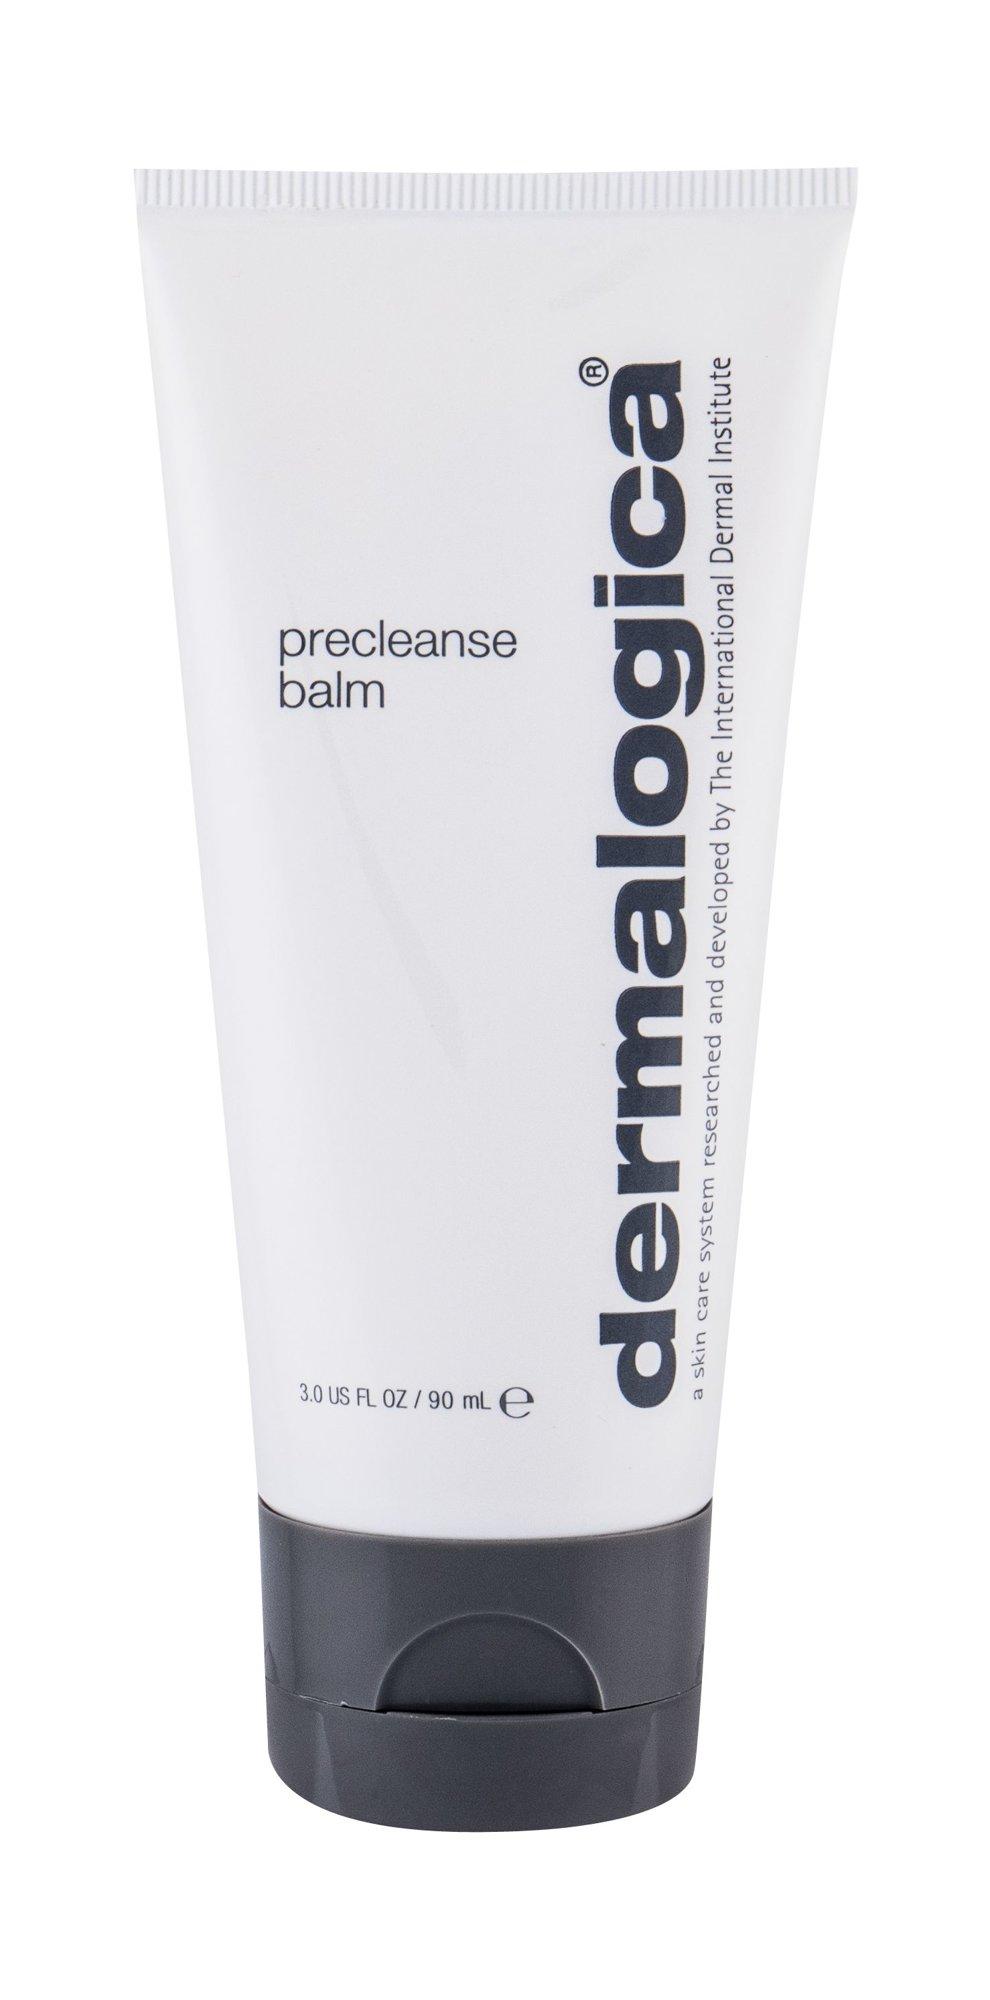 Dermalogica Daily Skin Health Cleansing Emulsion 90ml  Precleanse Balm